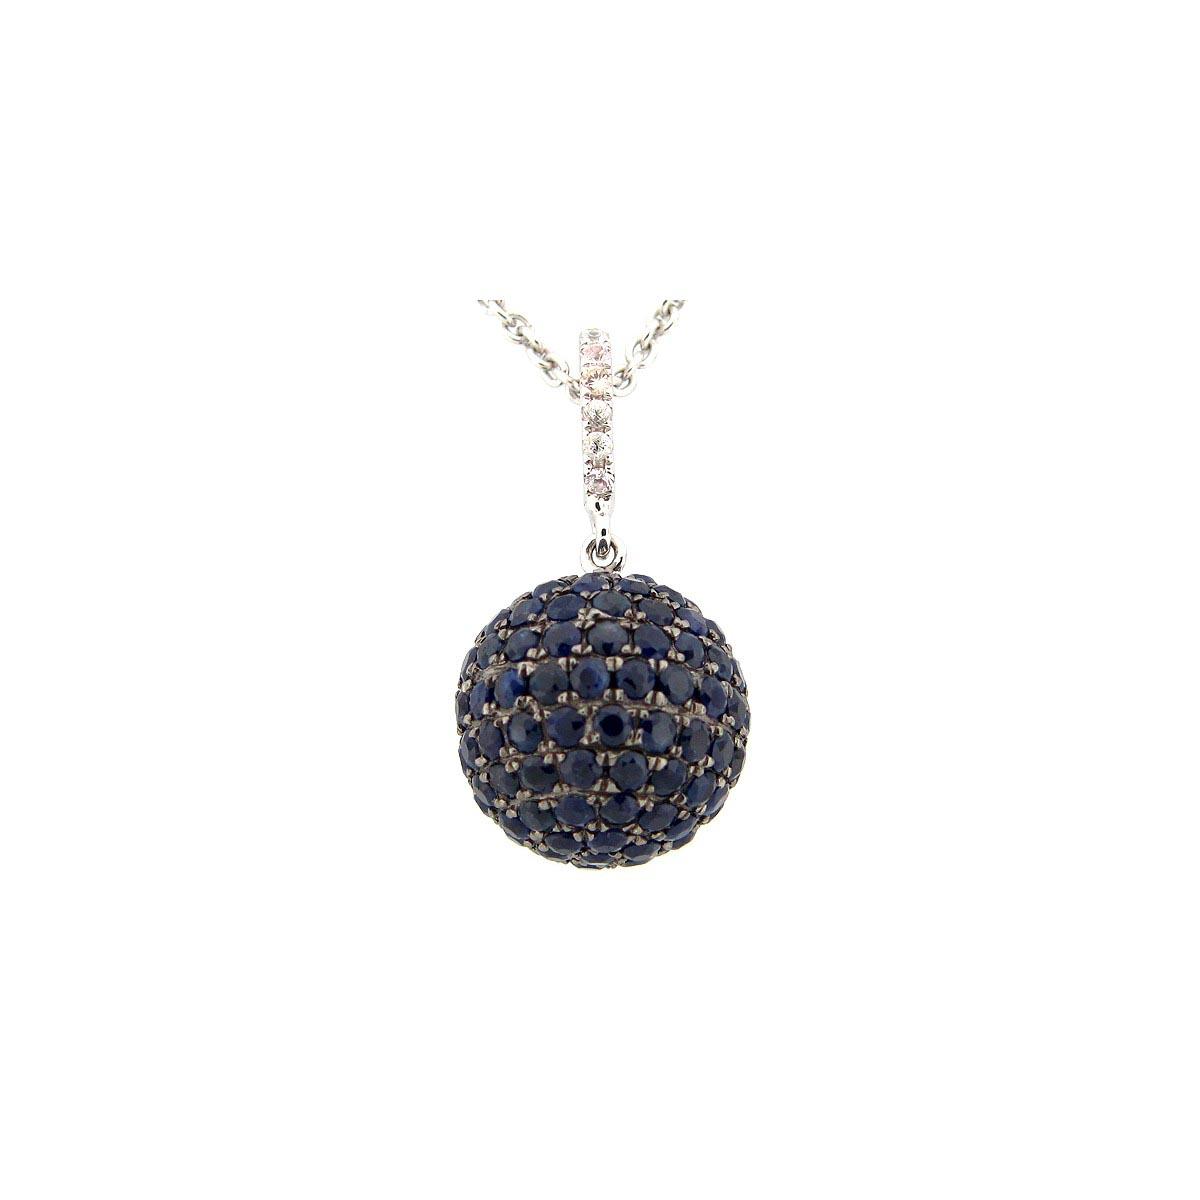 12MM Blue & White Sapphire Ball Pendant